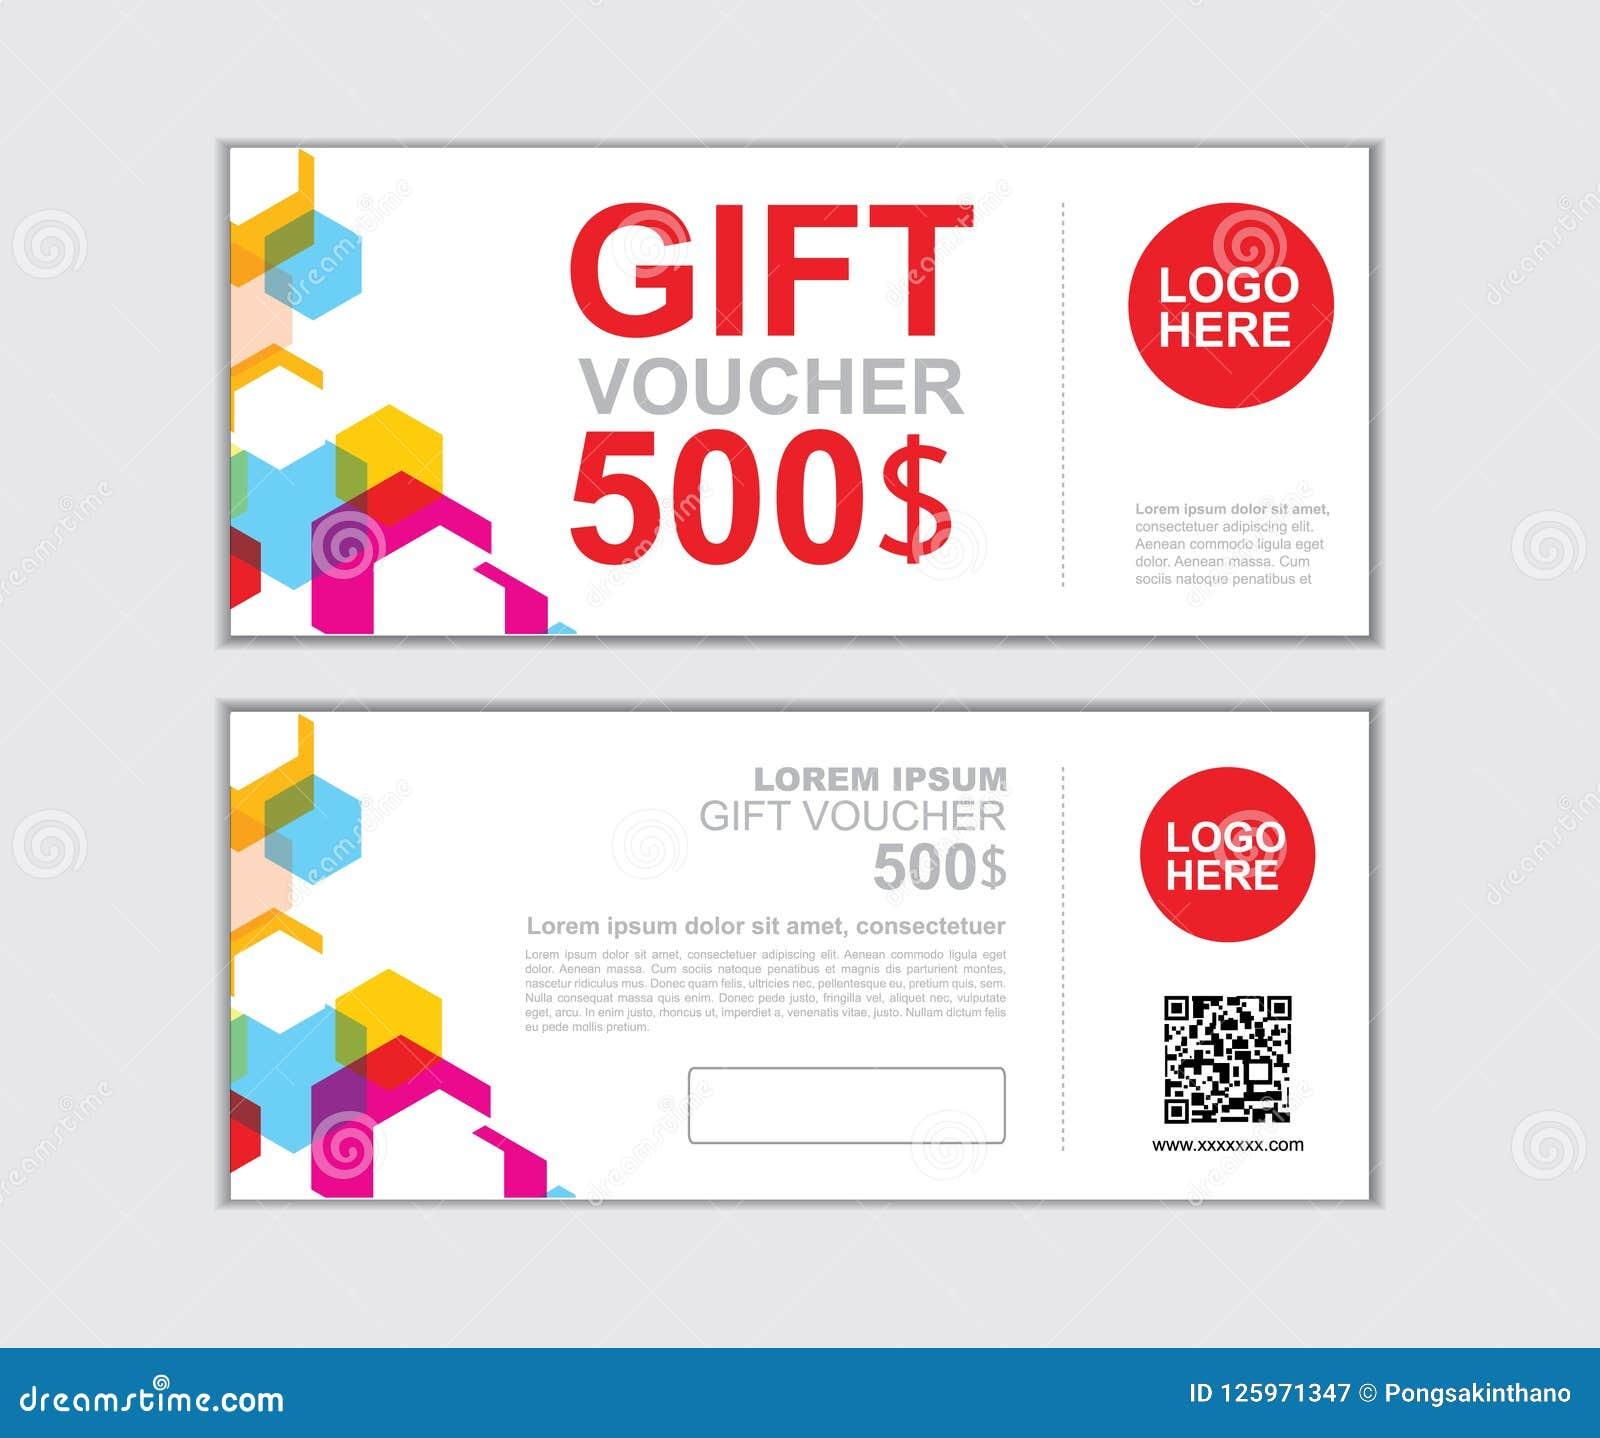 gift voucher vector design template for printing stock vector